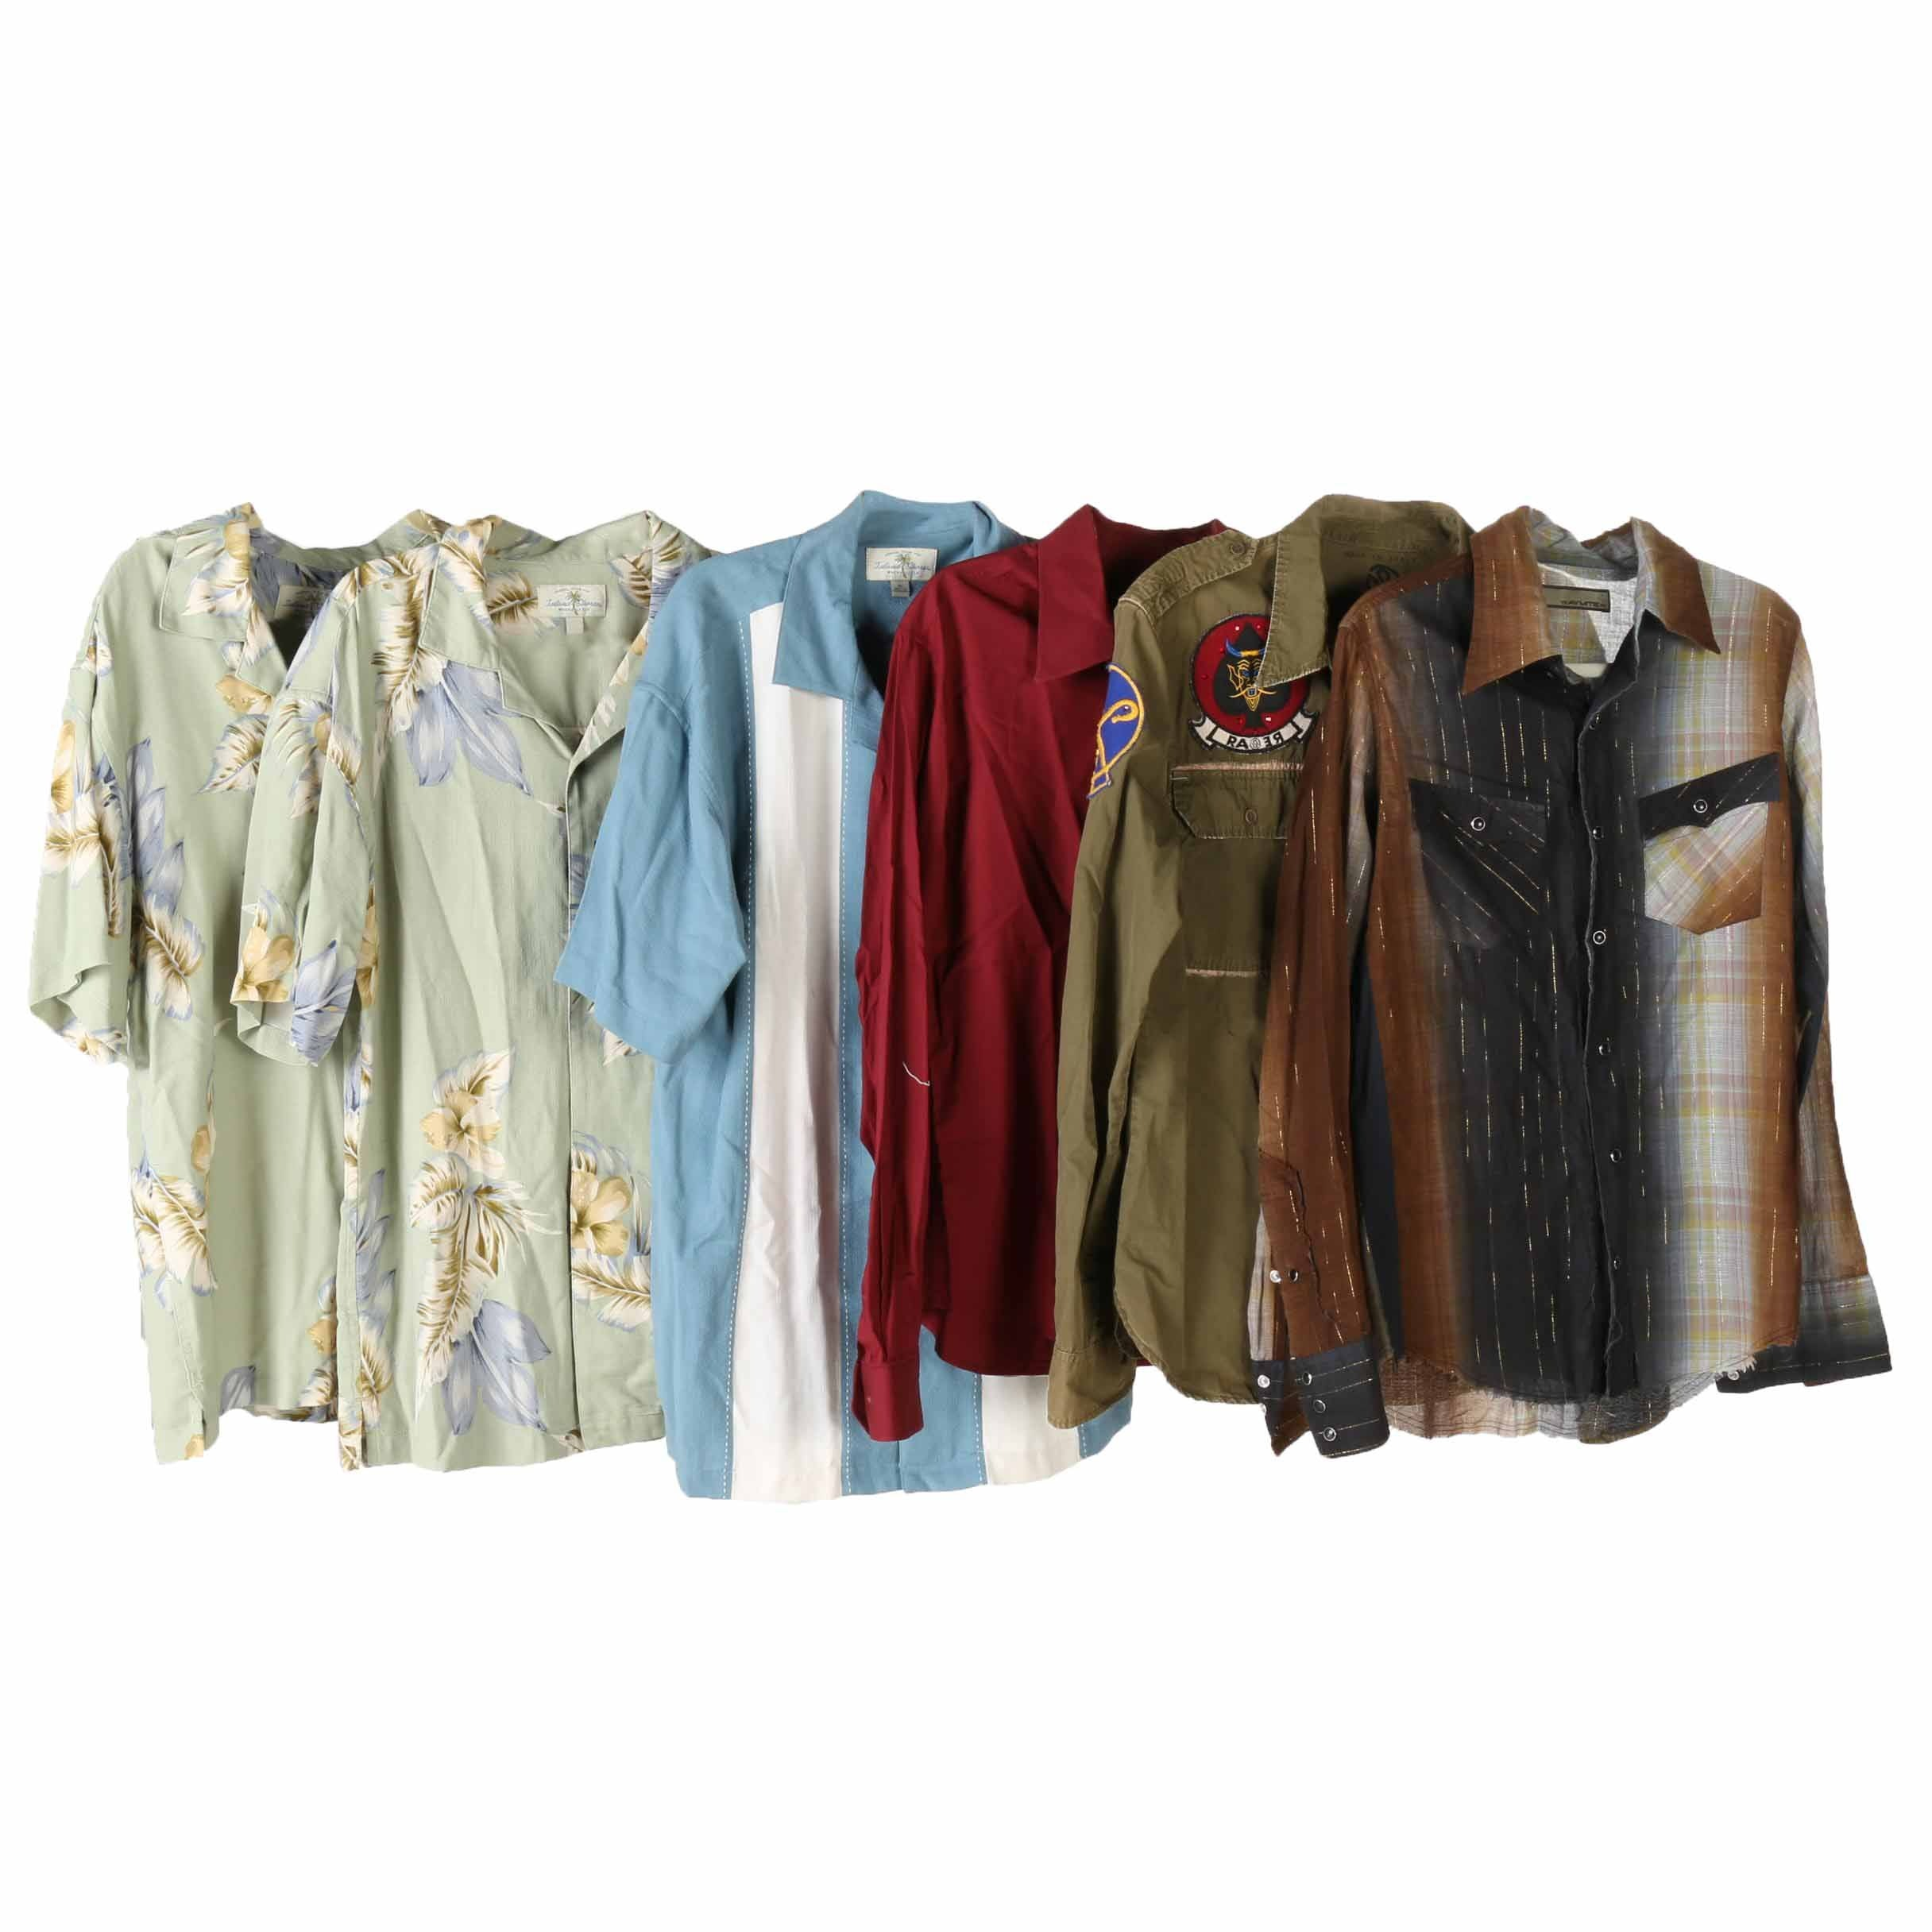 Men's Button Up Shirts Including Island Shores